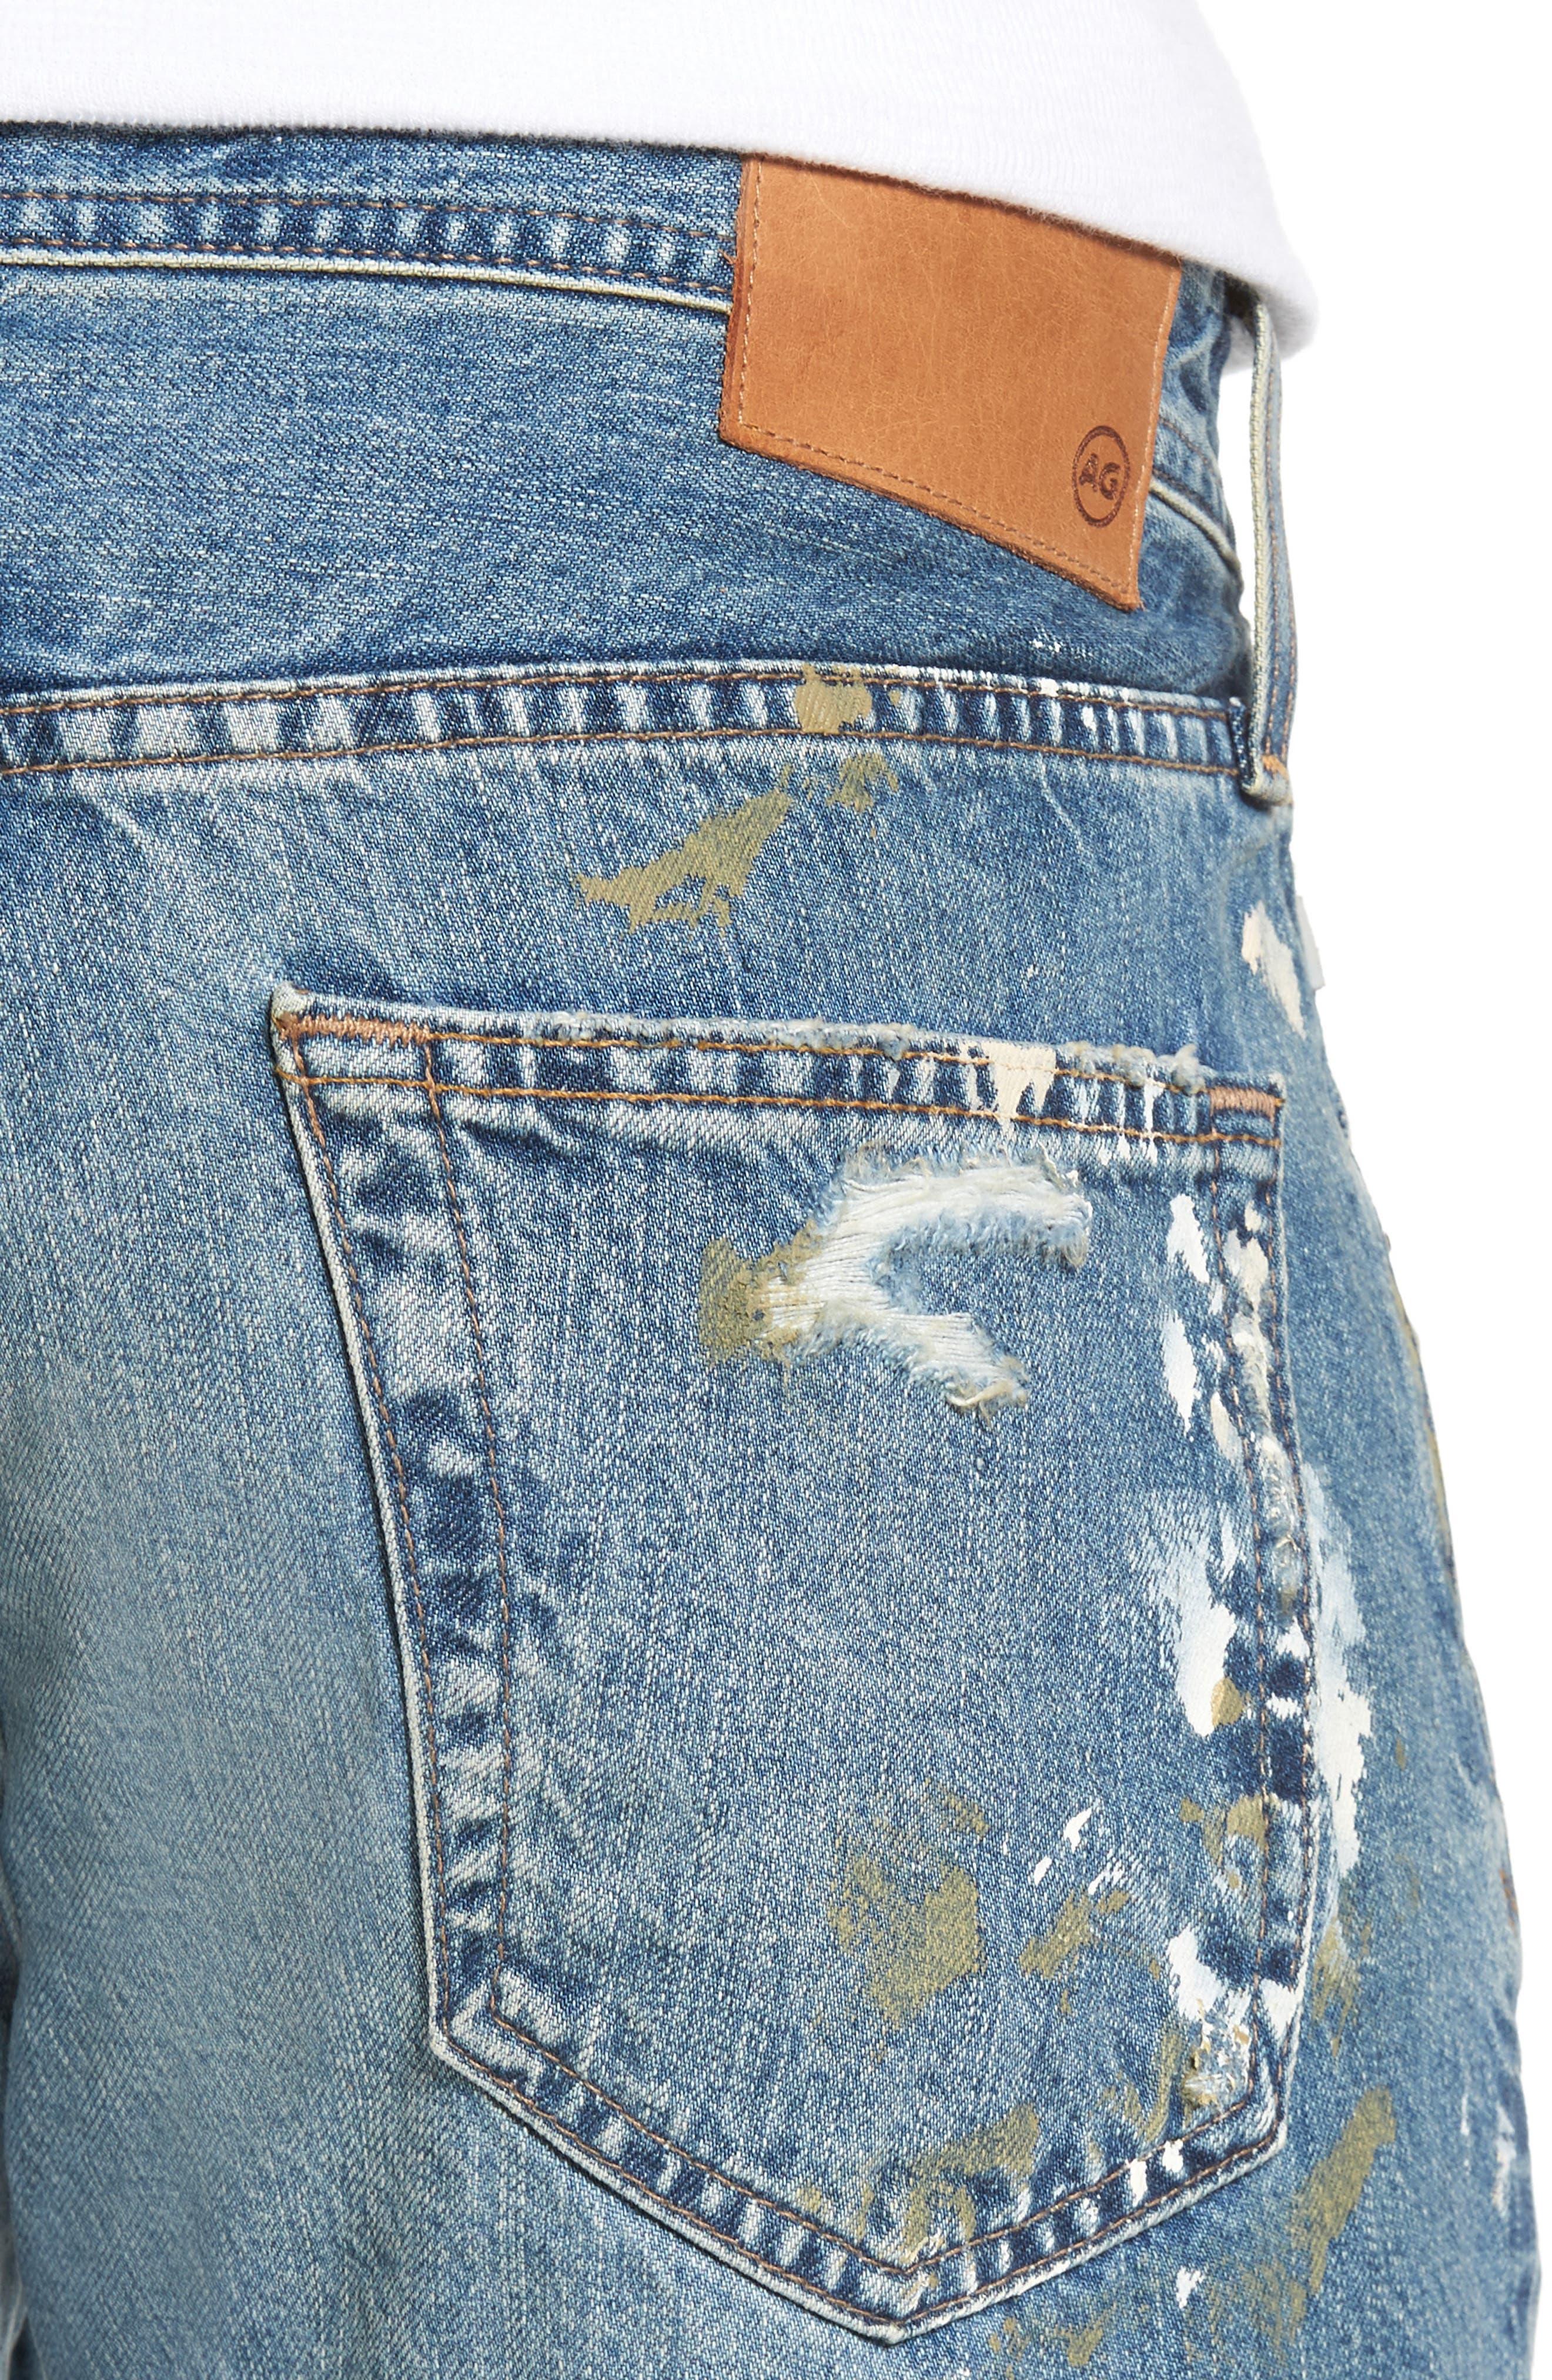 Tellis Modern Slim Fit Jeans,                             Alternate thumbnail 4, color,                             18 Years Carpenter